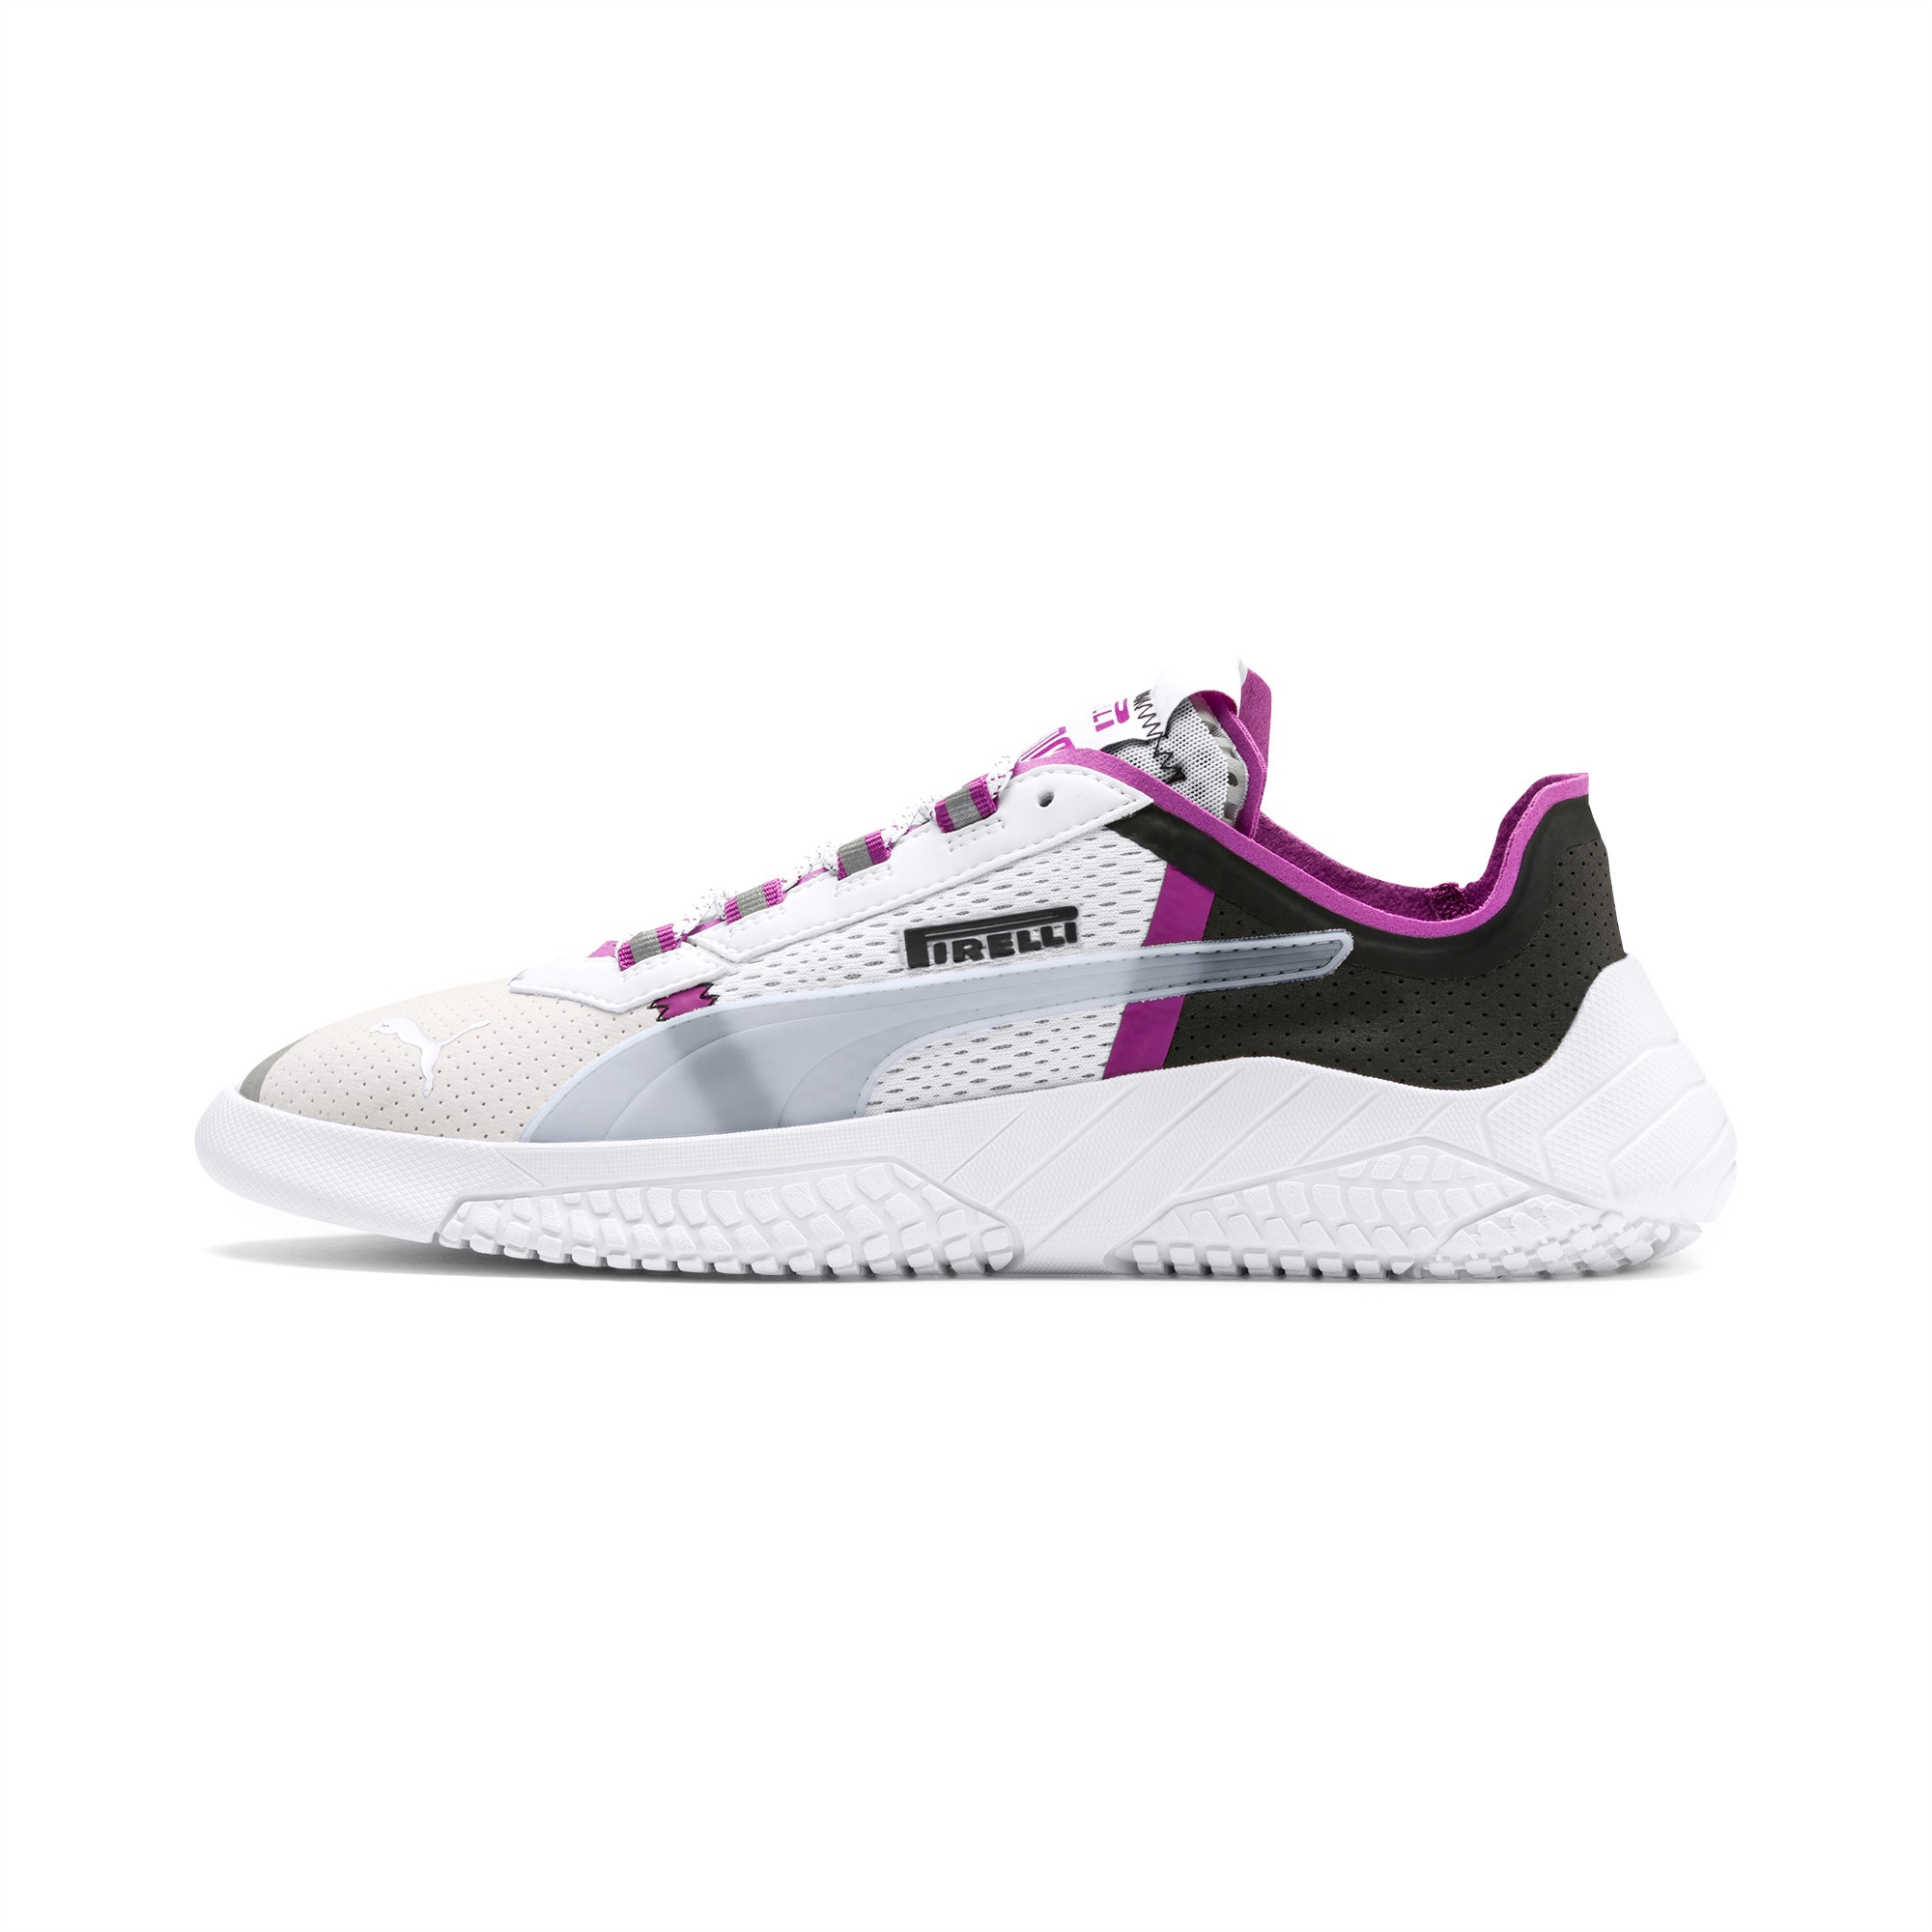 PUMA x PIRELLI Replicat X Sneaker | White Hyacinth Viol Red